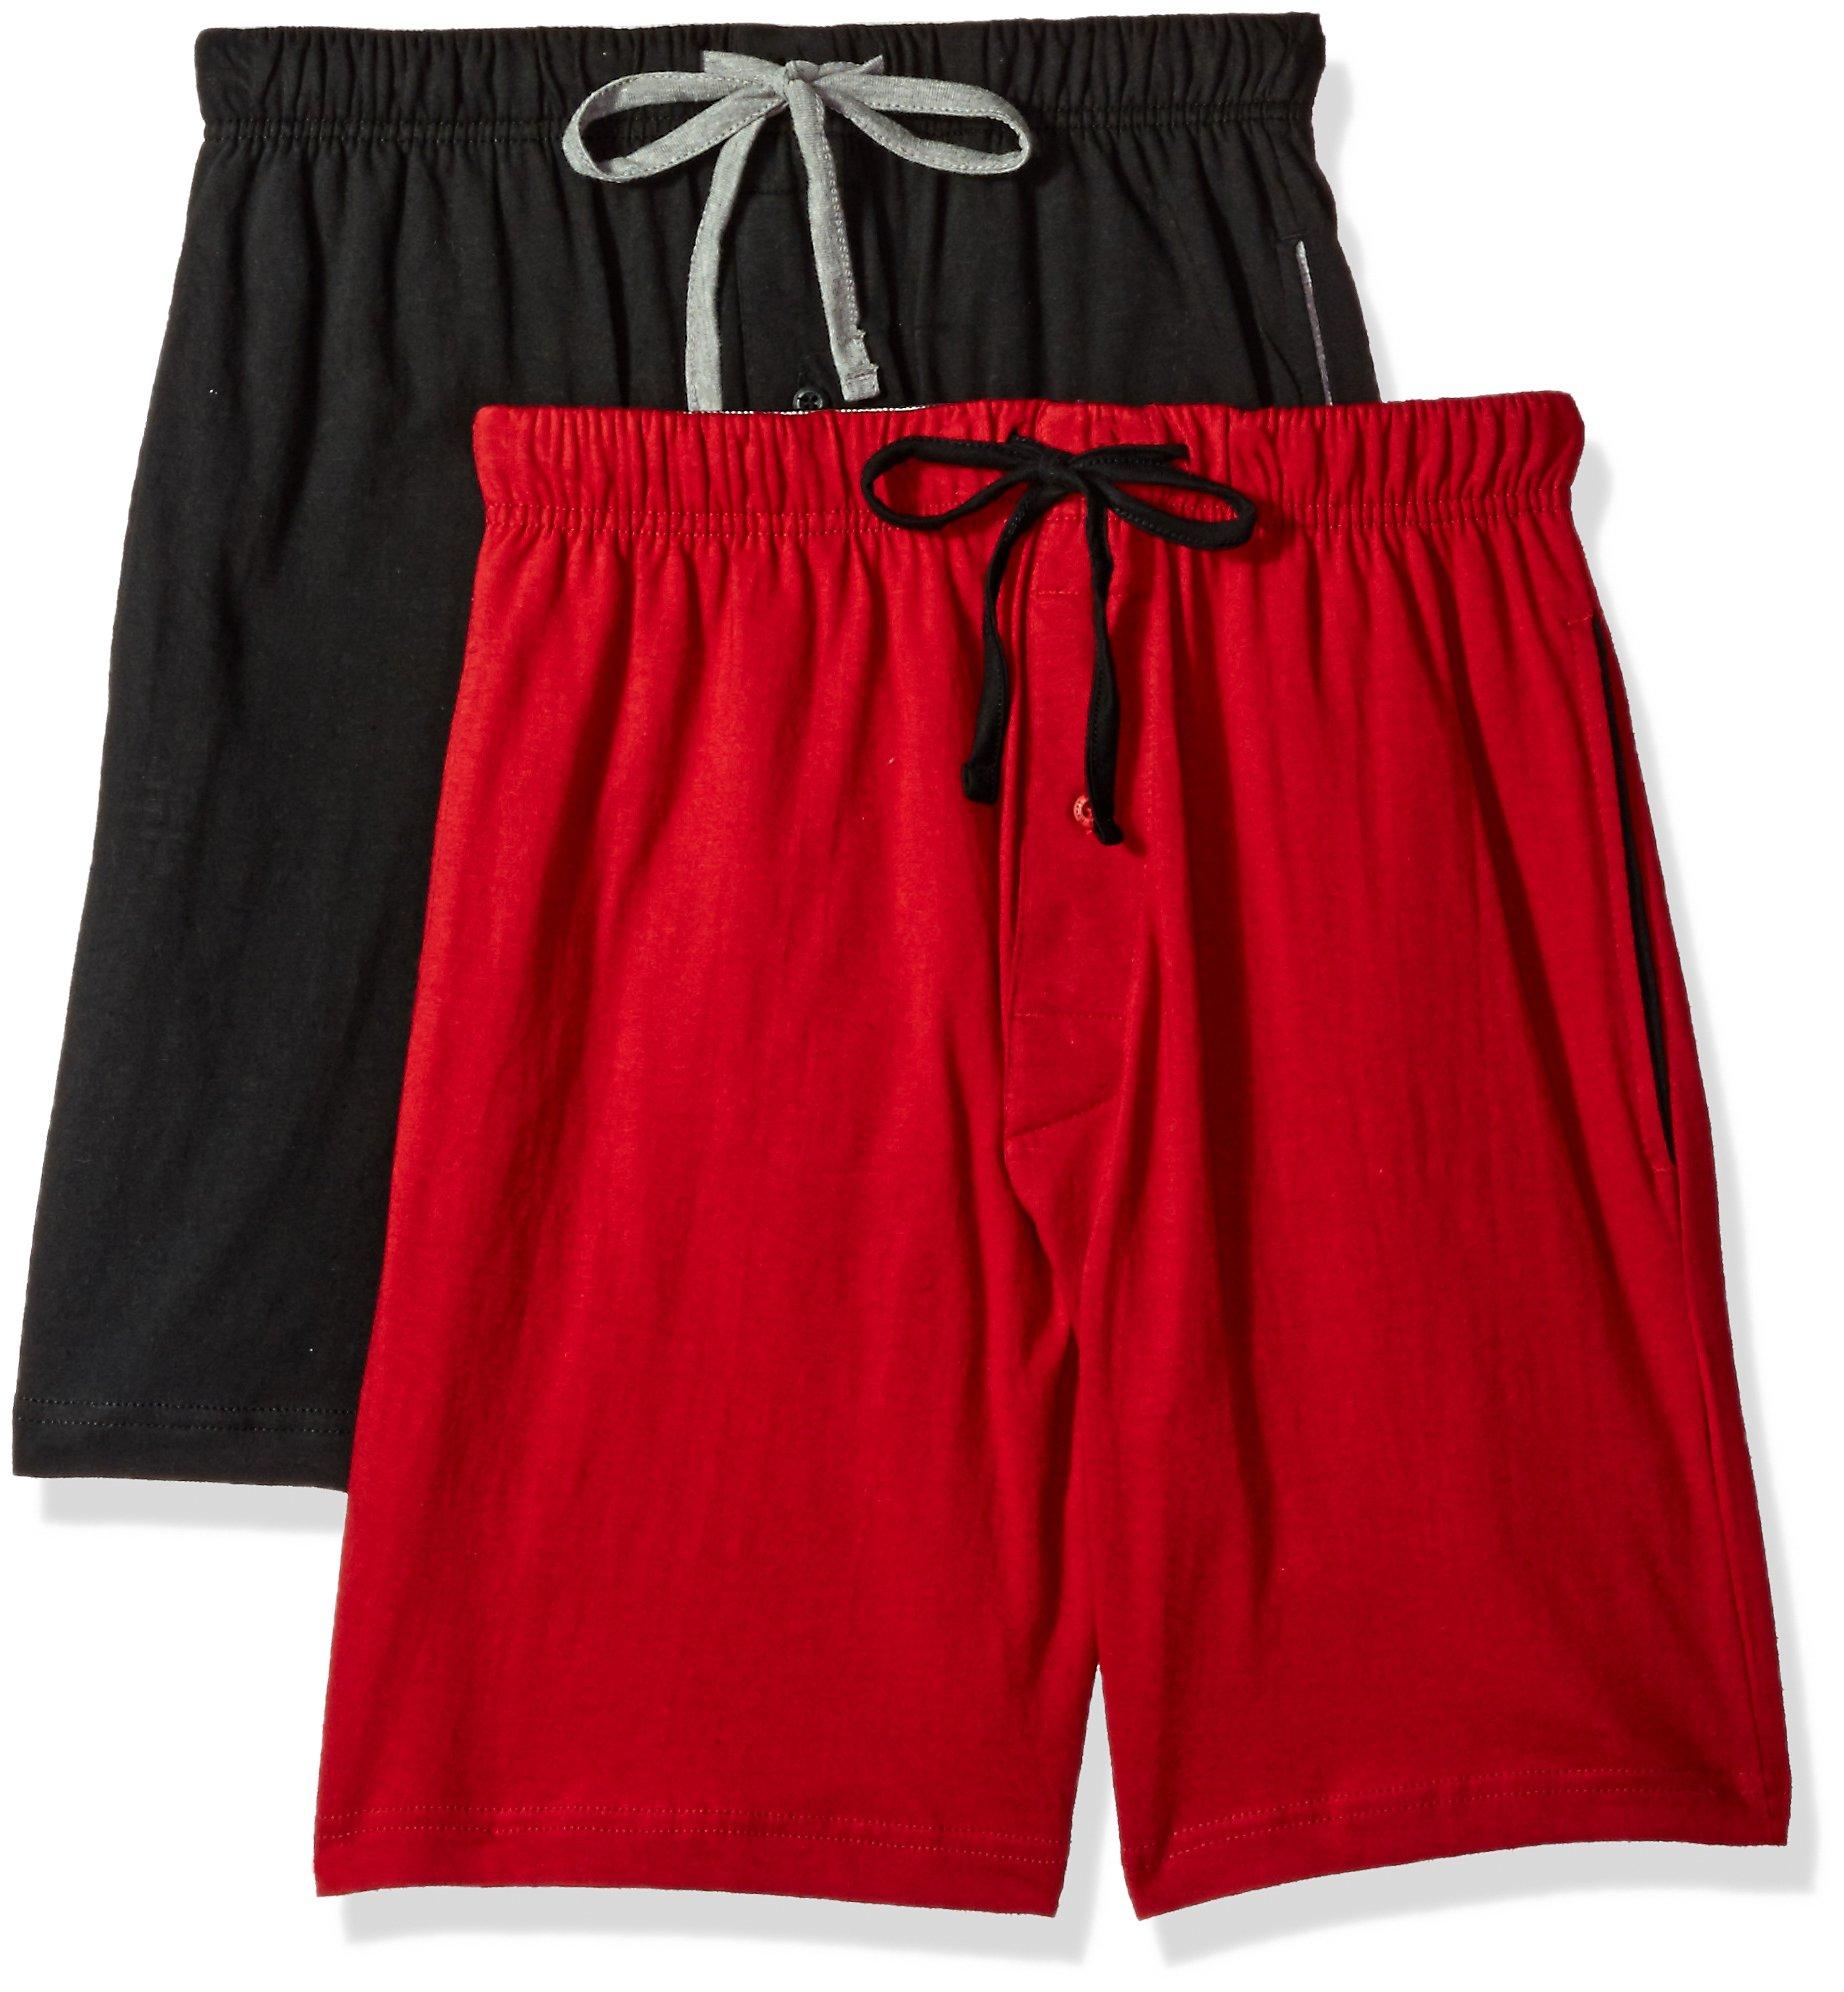 Hanes Men's Logo Knit Shorts 2-Pack Biking Red-Black 5XL Hanes Men's Logo Knit Shorts 2-Pack